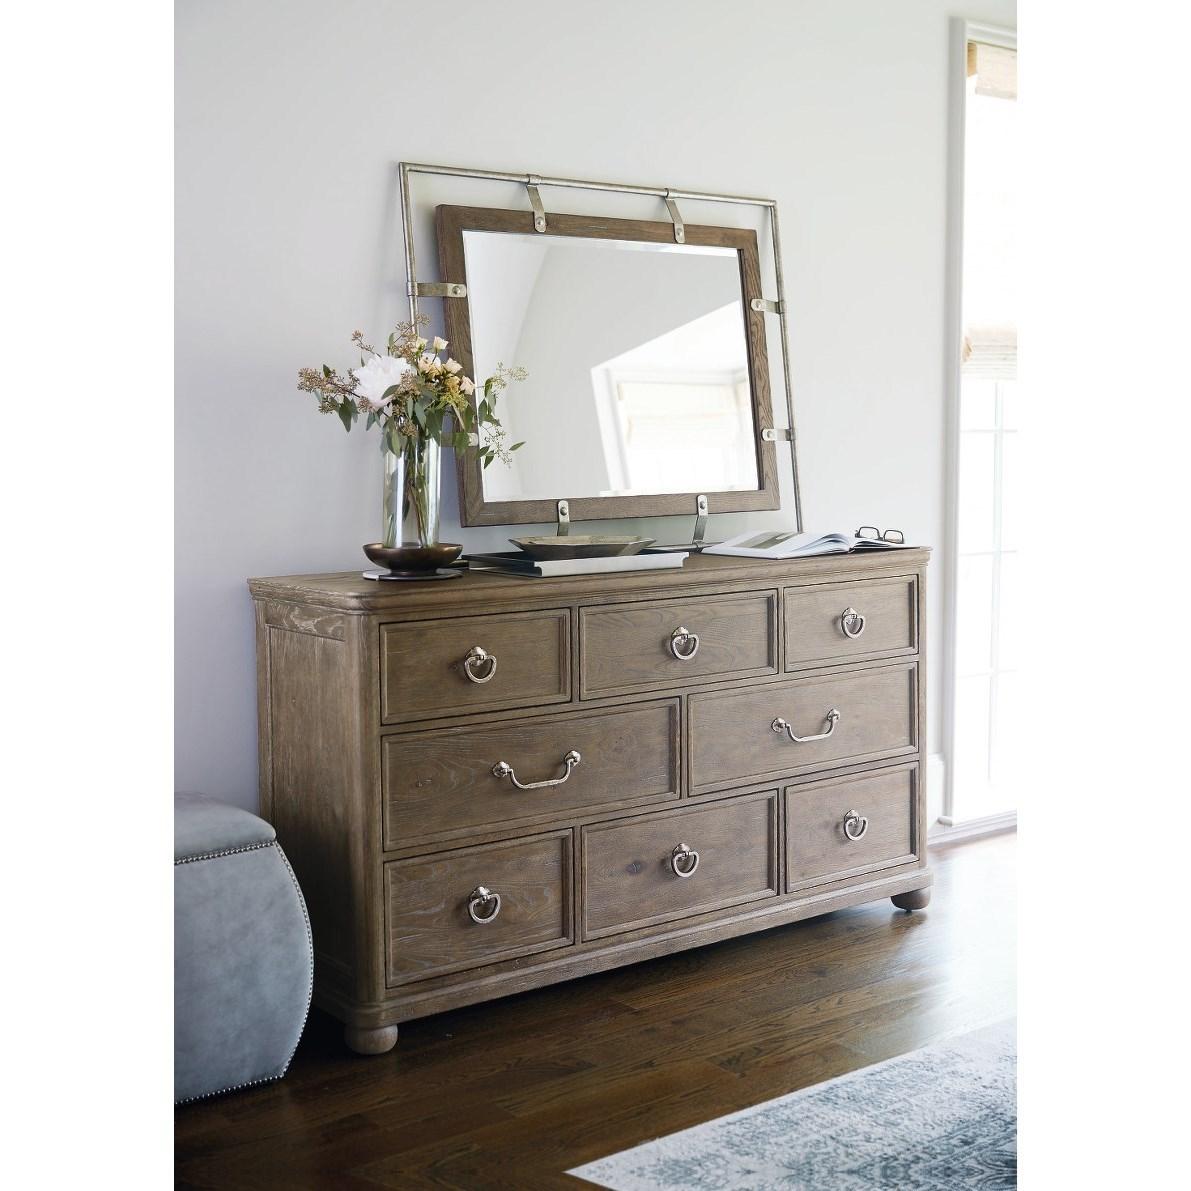 Bernhardt Rustic Patina 387 052d 321d Rustic 8 Drawer Dresser And Mirror Set O Dunk O Bright Furniture Dresser Mirror Sets